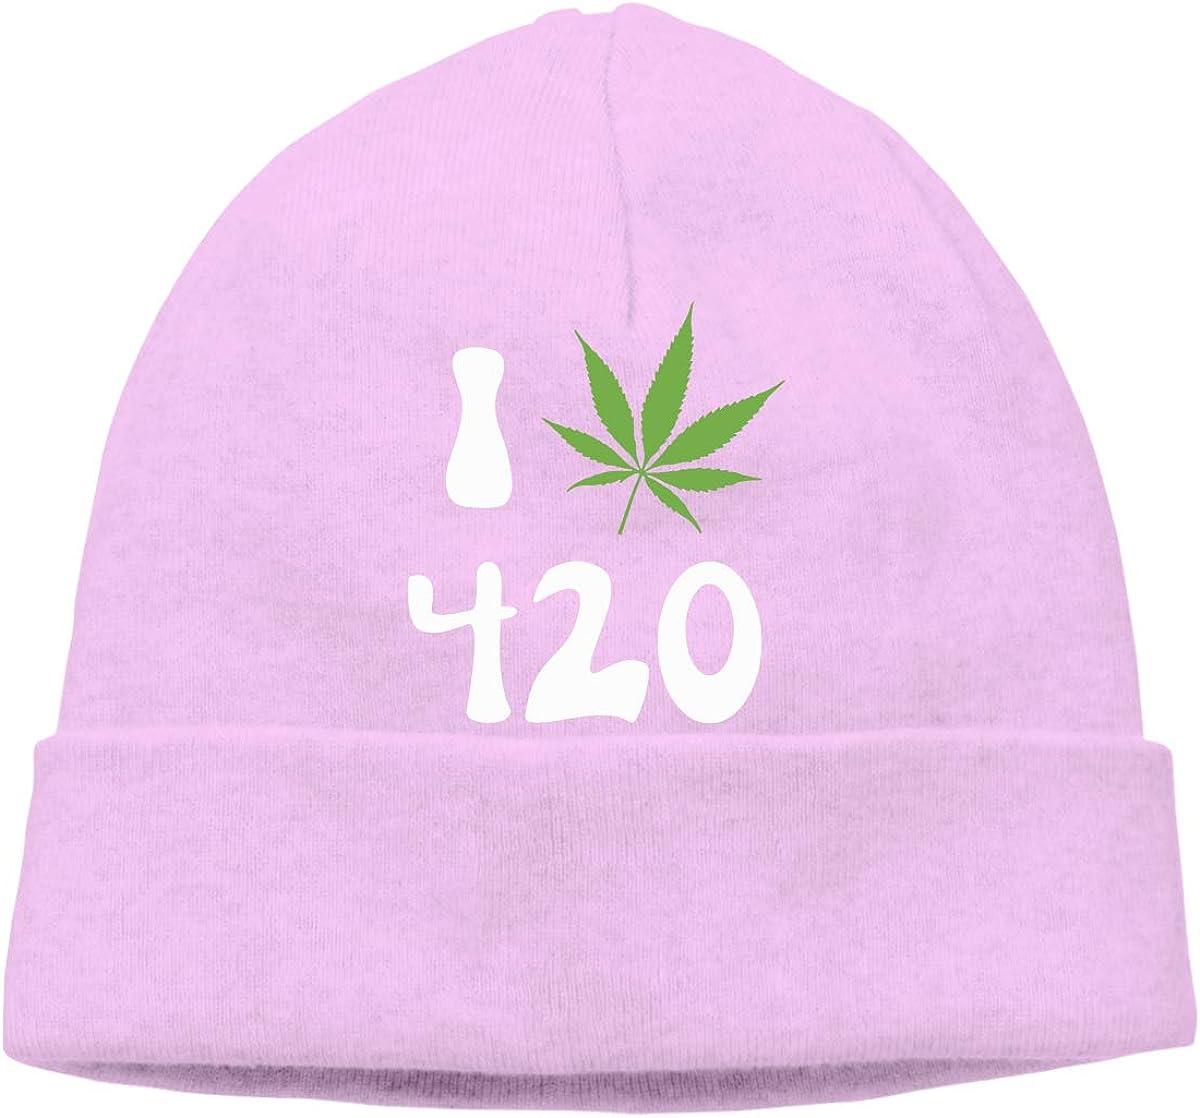 Unisex I Love 420 Soft Knit Beanie Caps Soft Hat